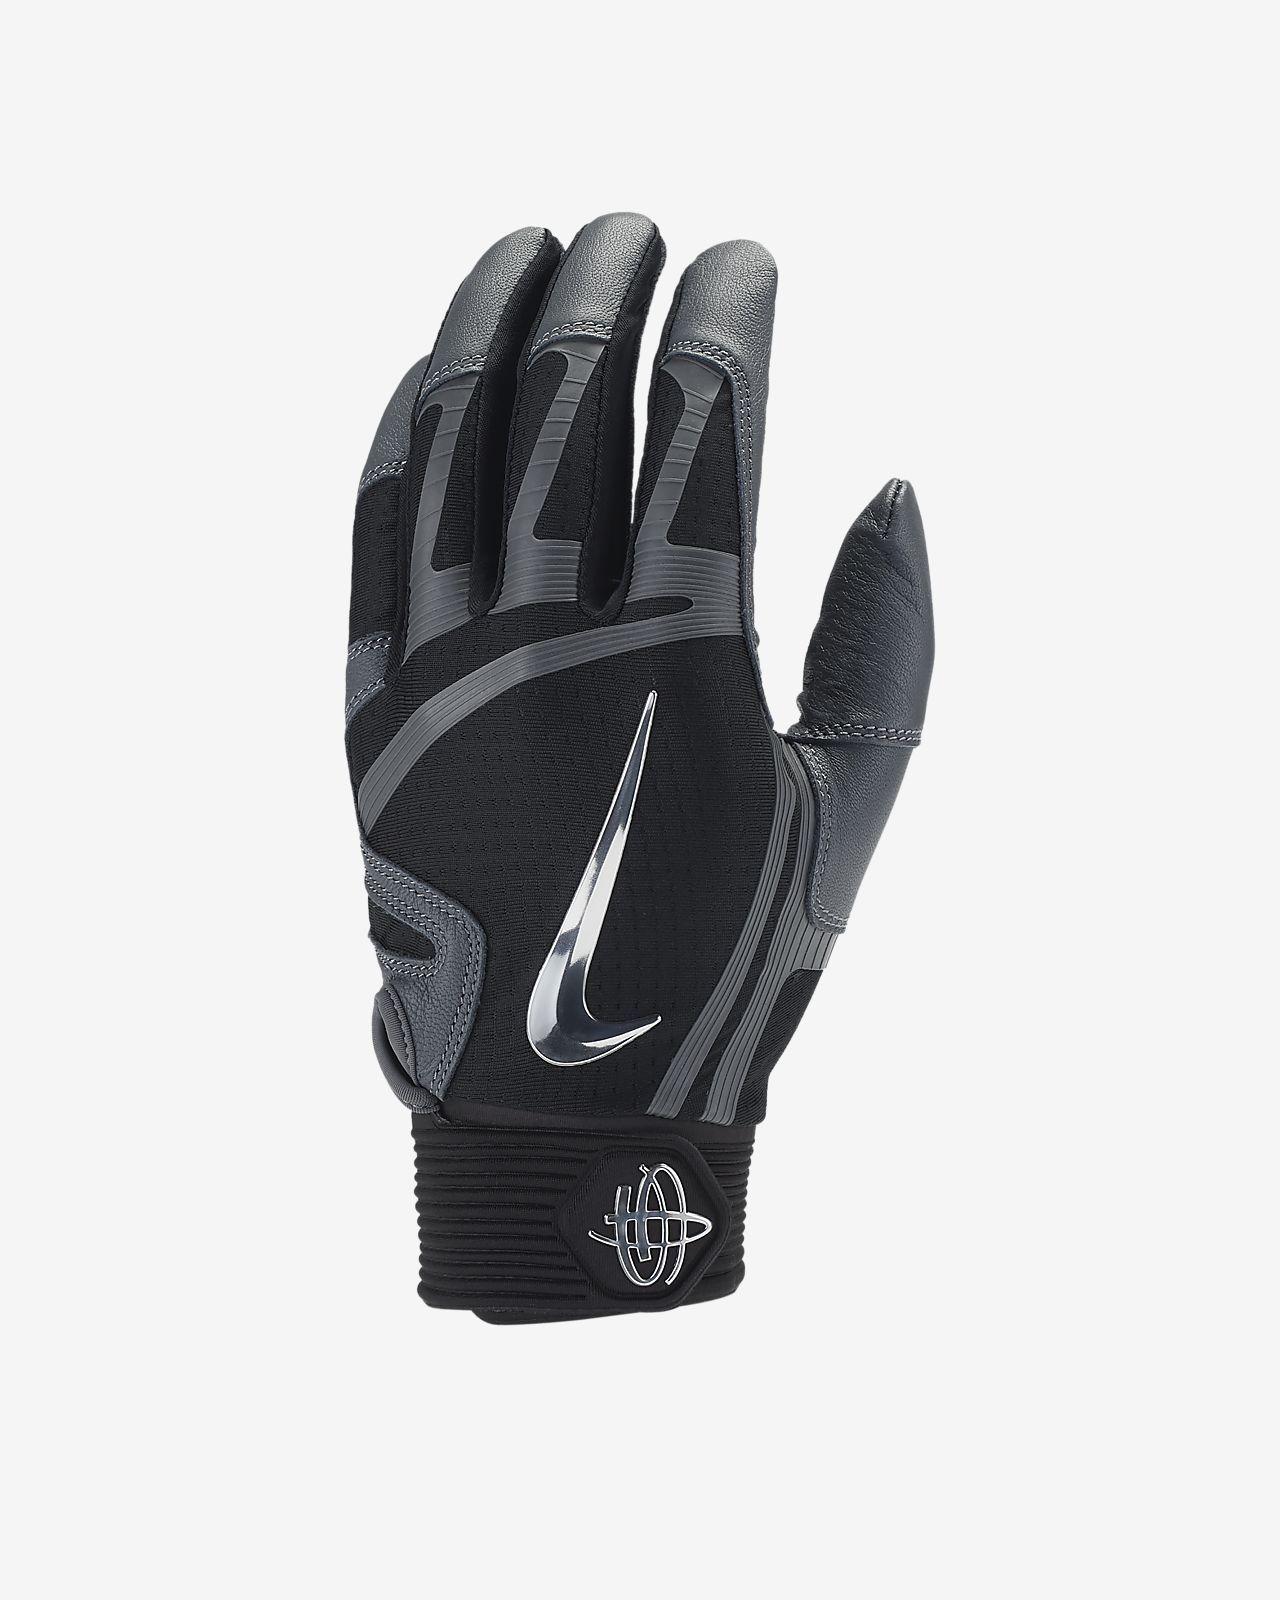 Nike Huarache Elite Baseball Batting Gloves Batting Gloves Tennis Shoes Outfit Nike Tennis Shoes Outfit